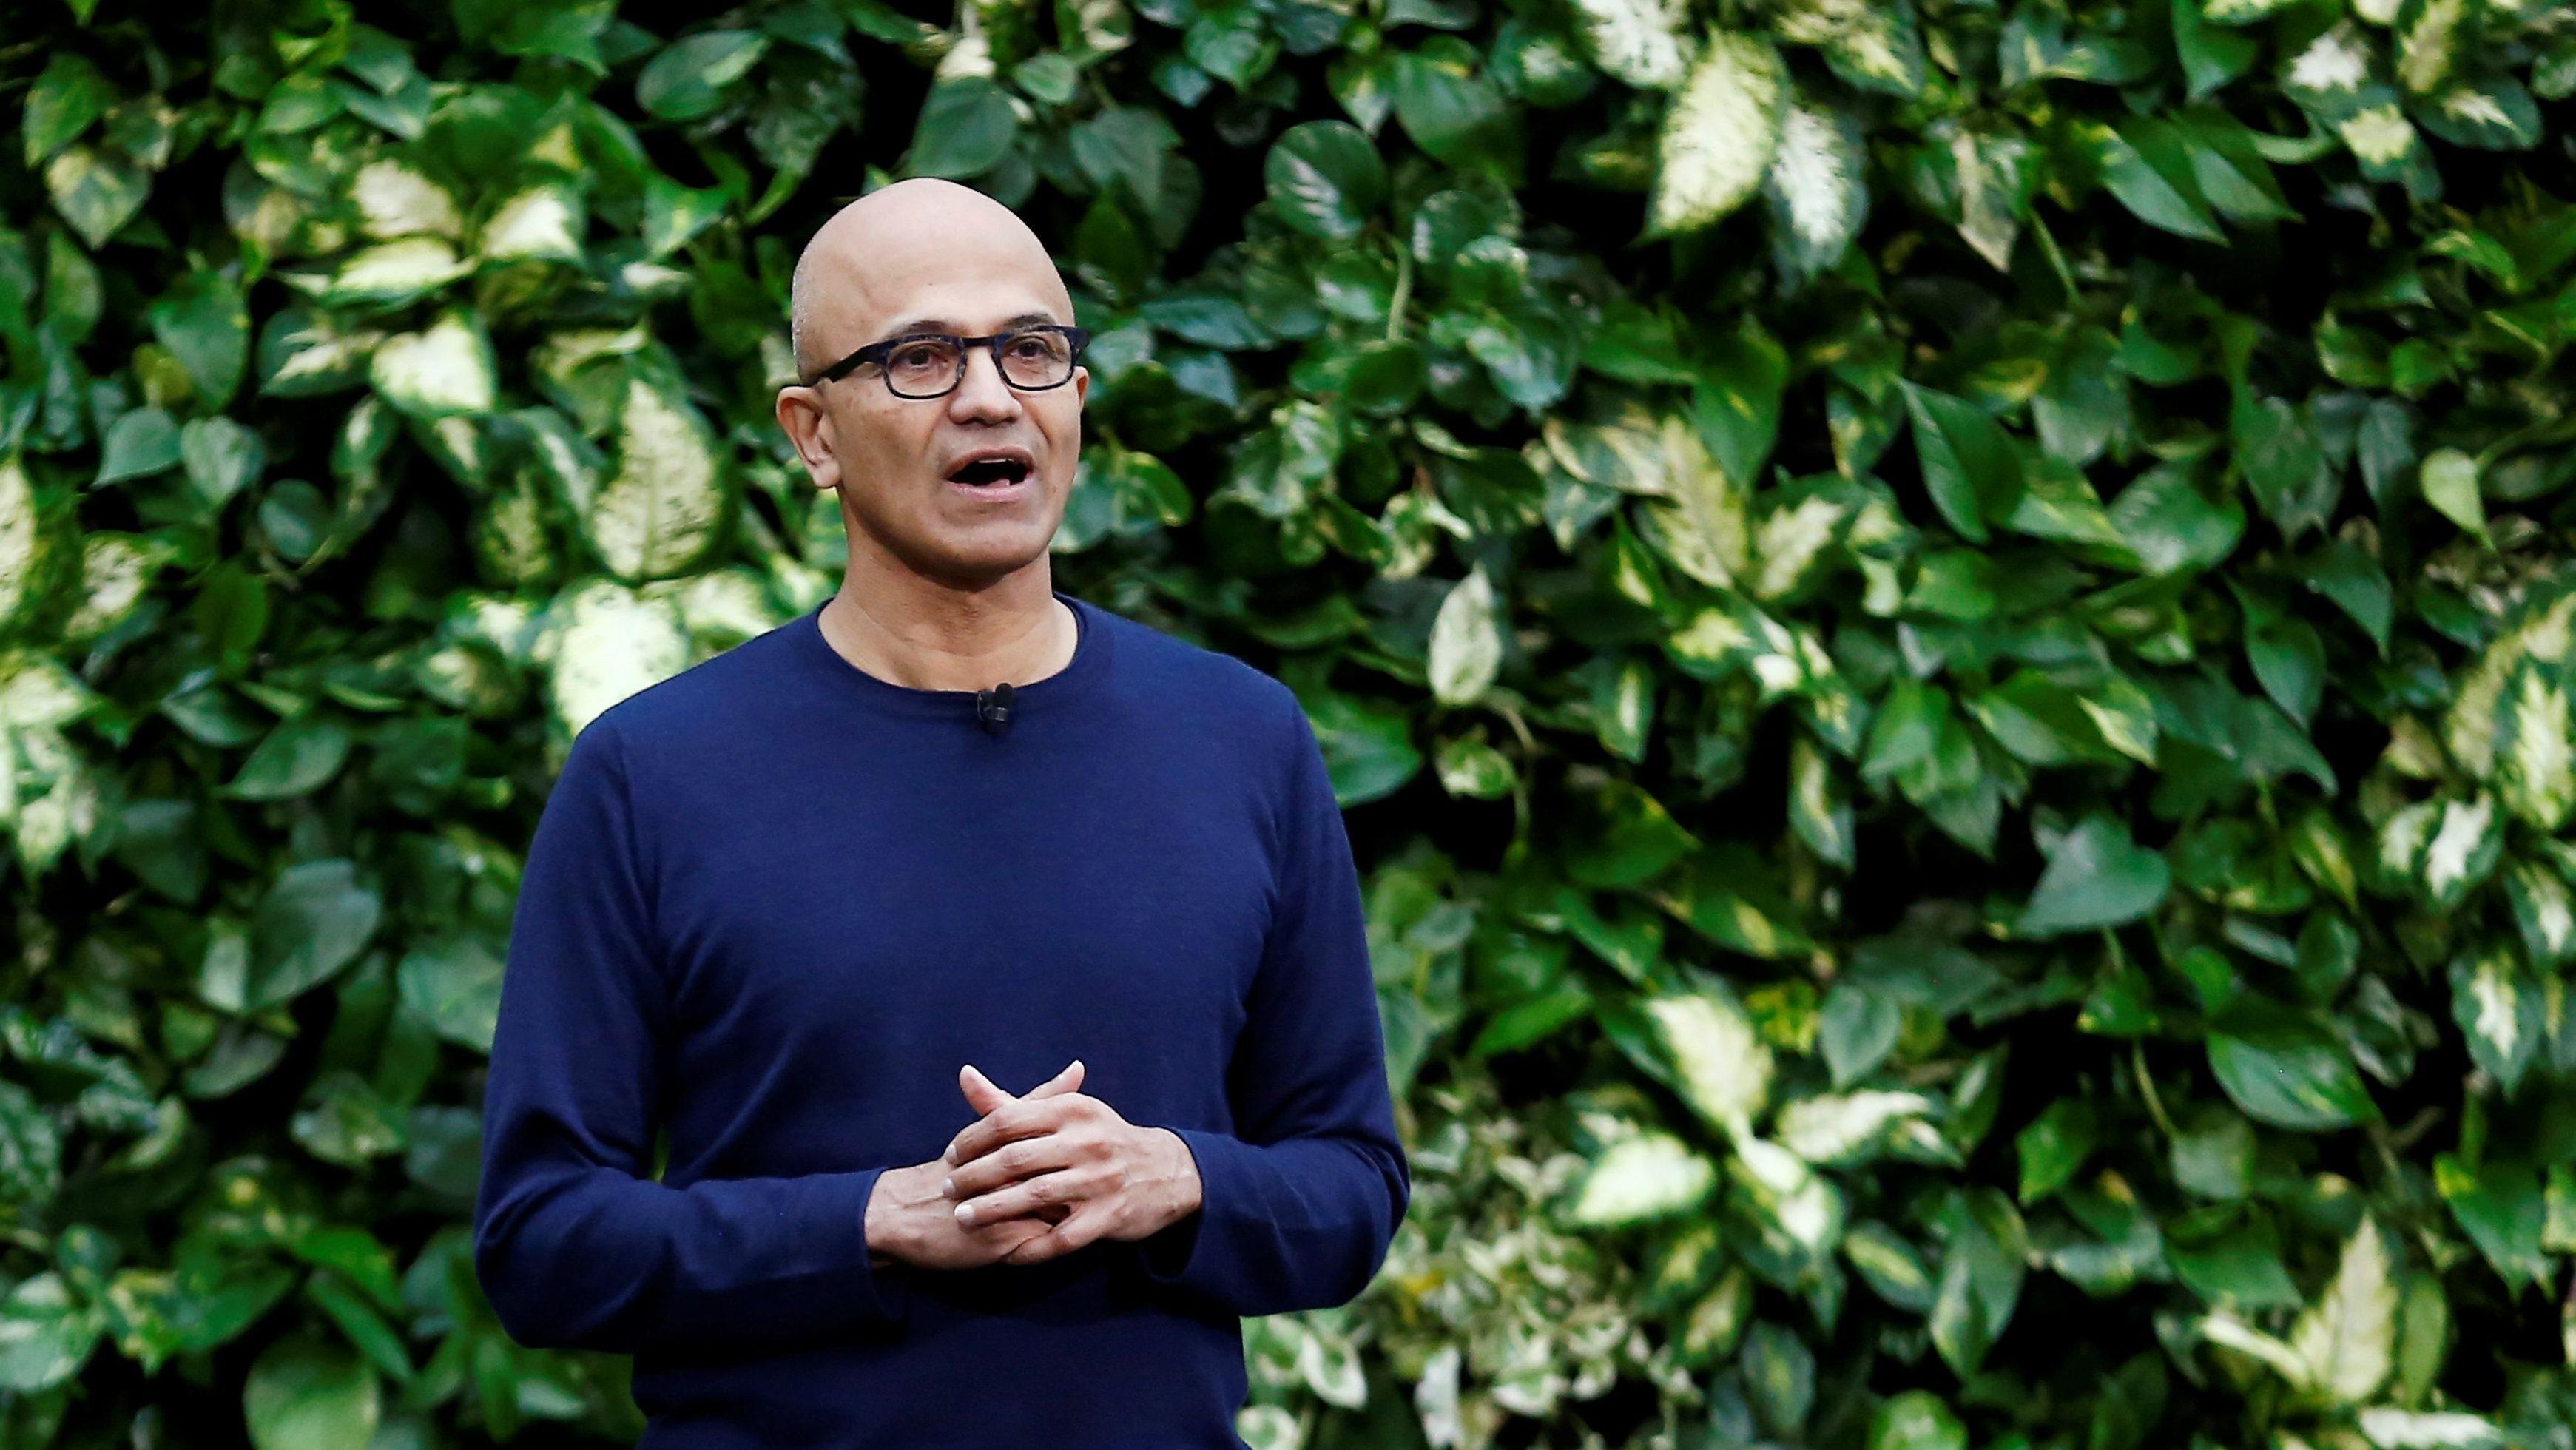 Microsoft has given us a glimpse of a carbon-negative future